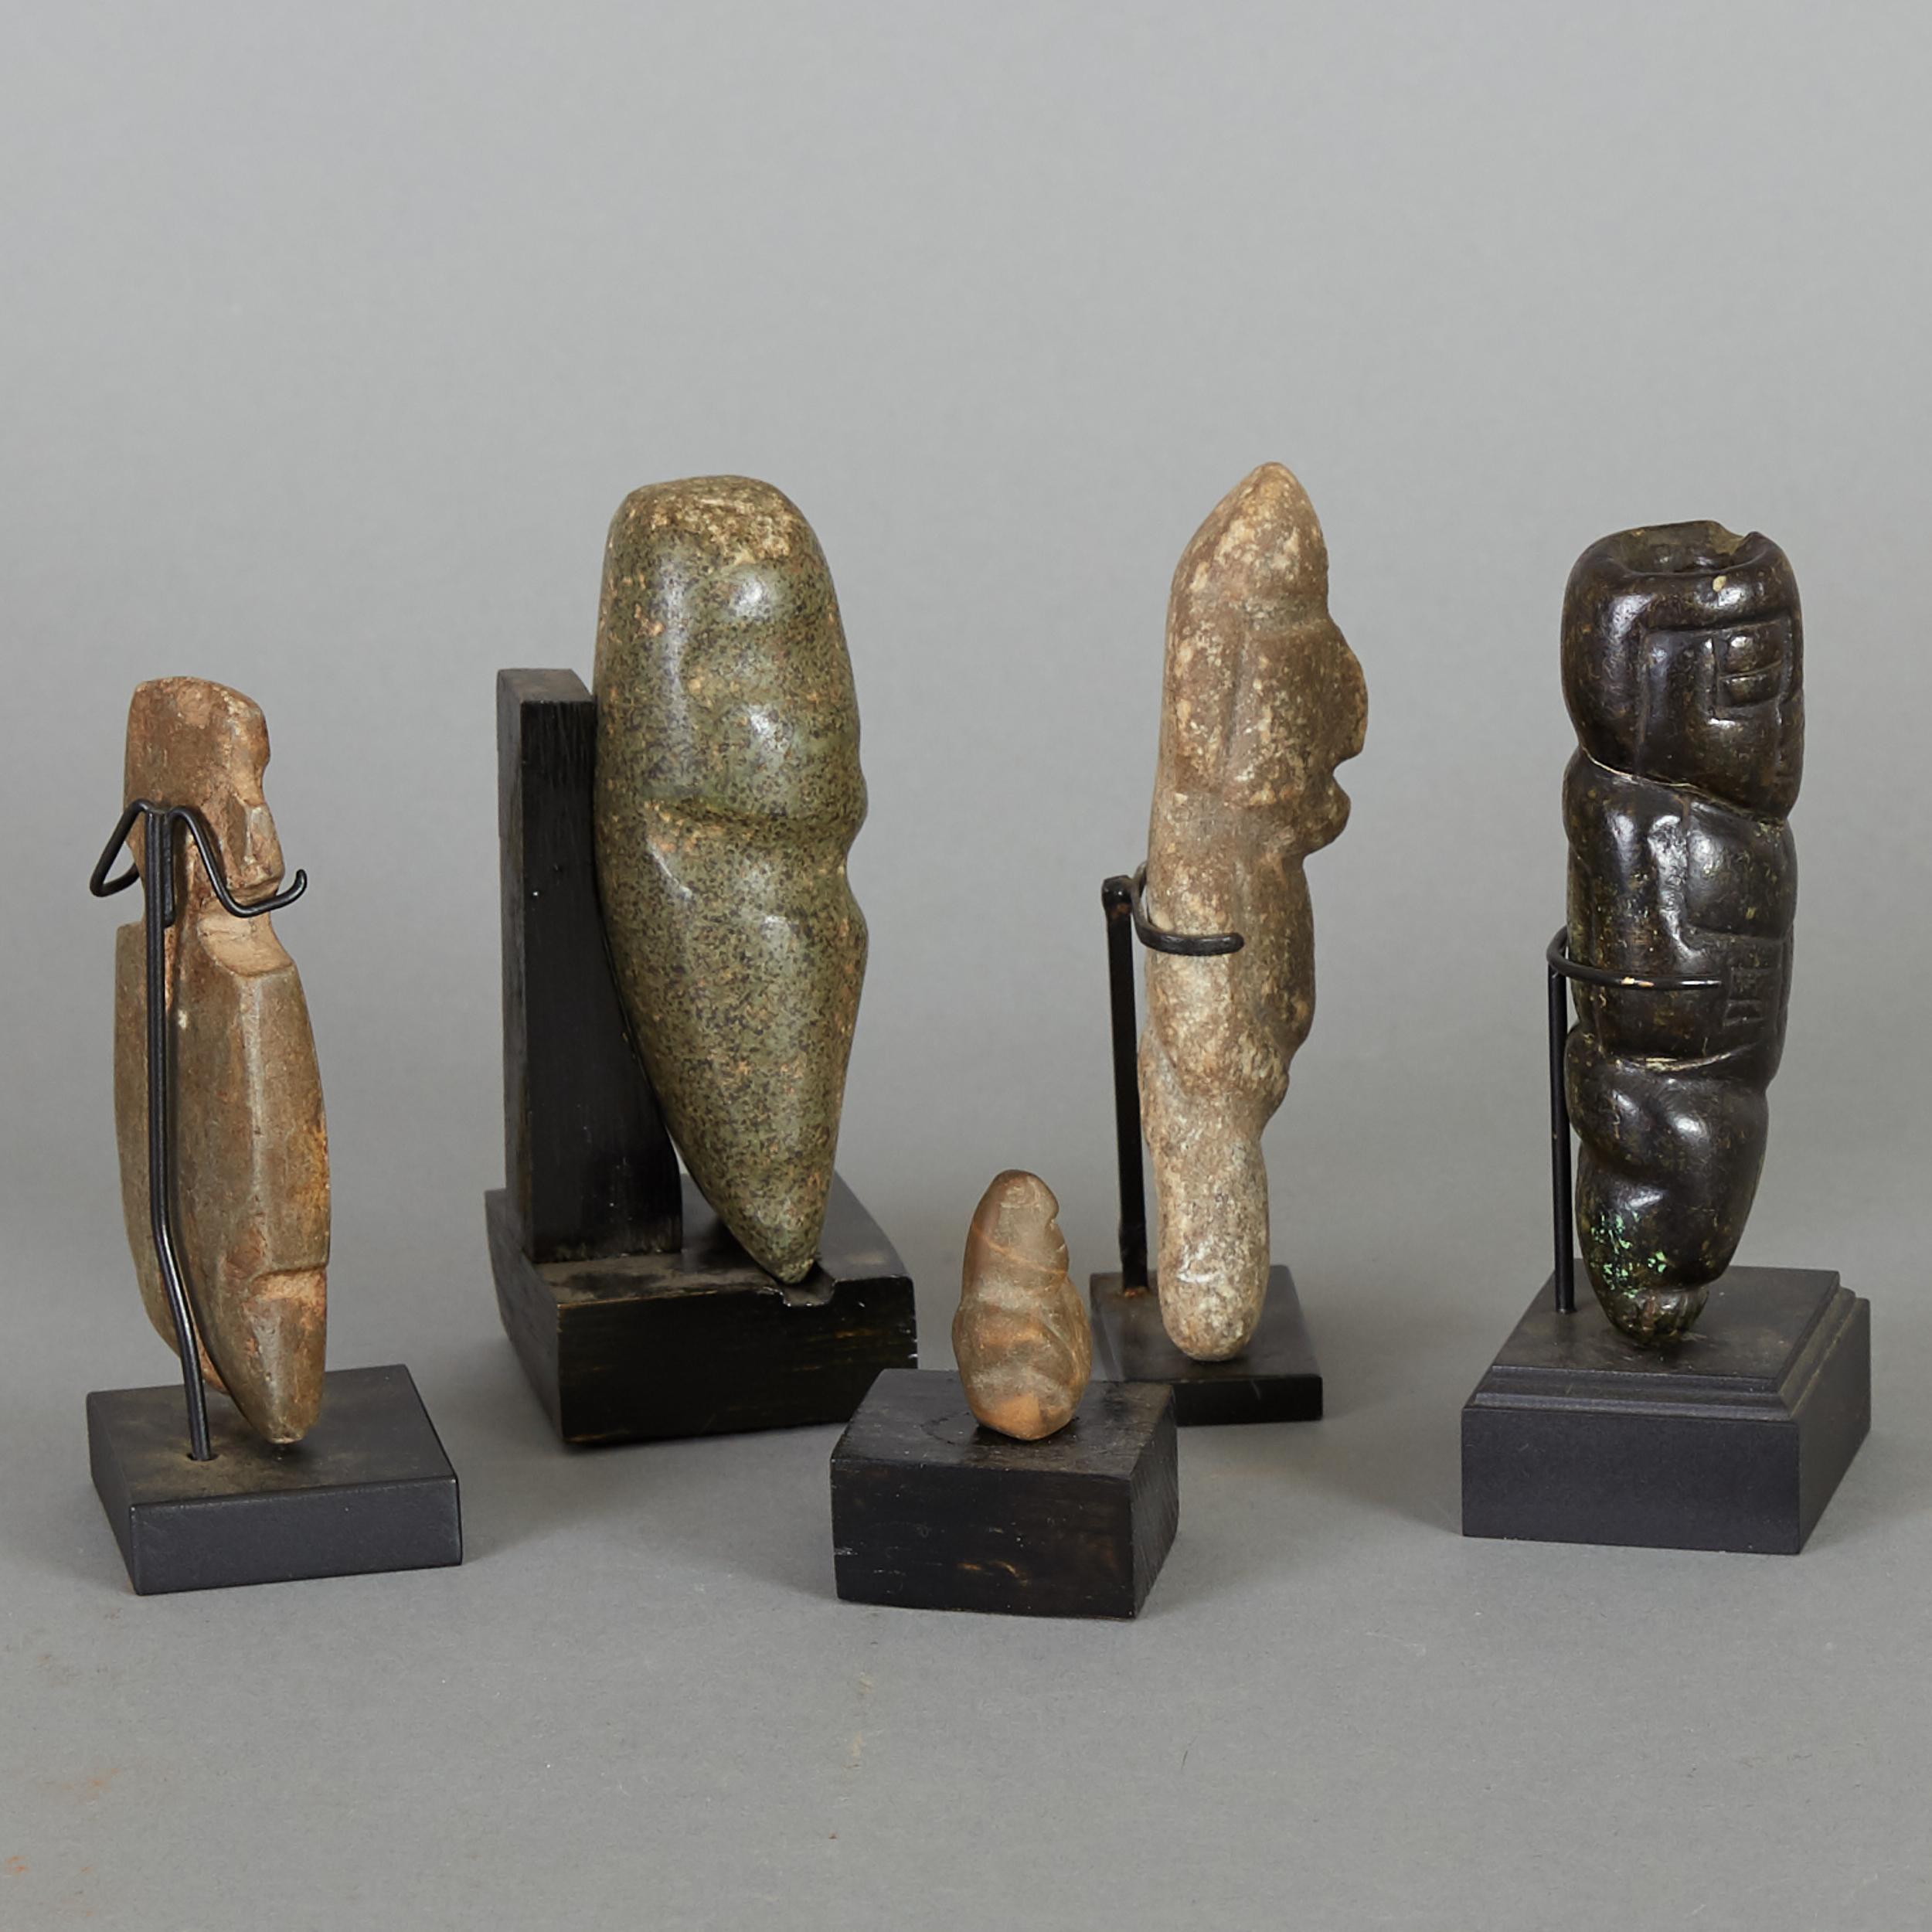 Lot 192 - 5 Pre-Columbian Stone Figurines